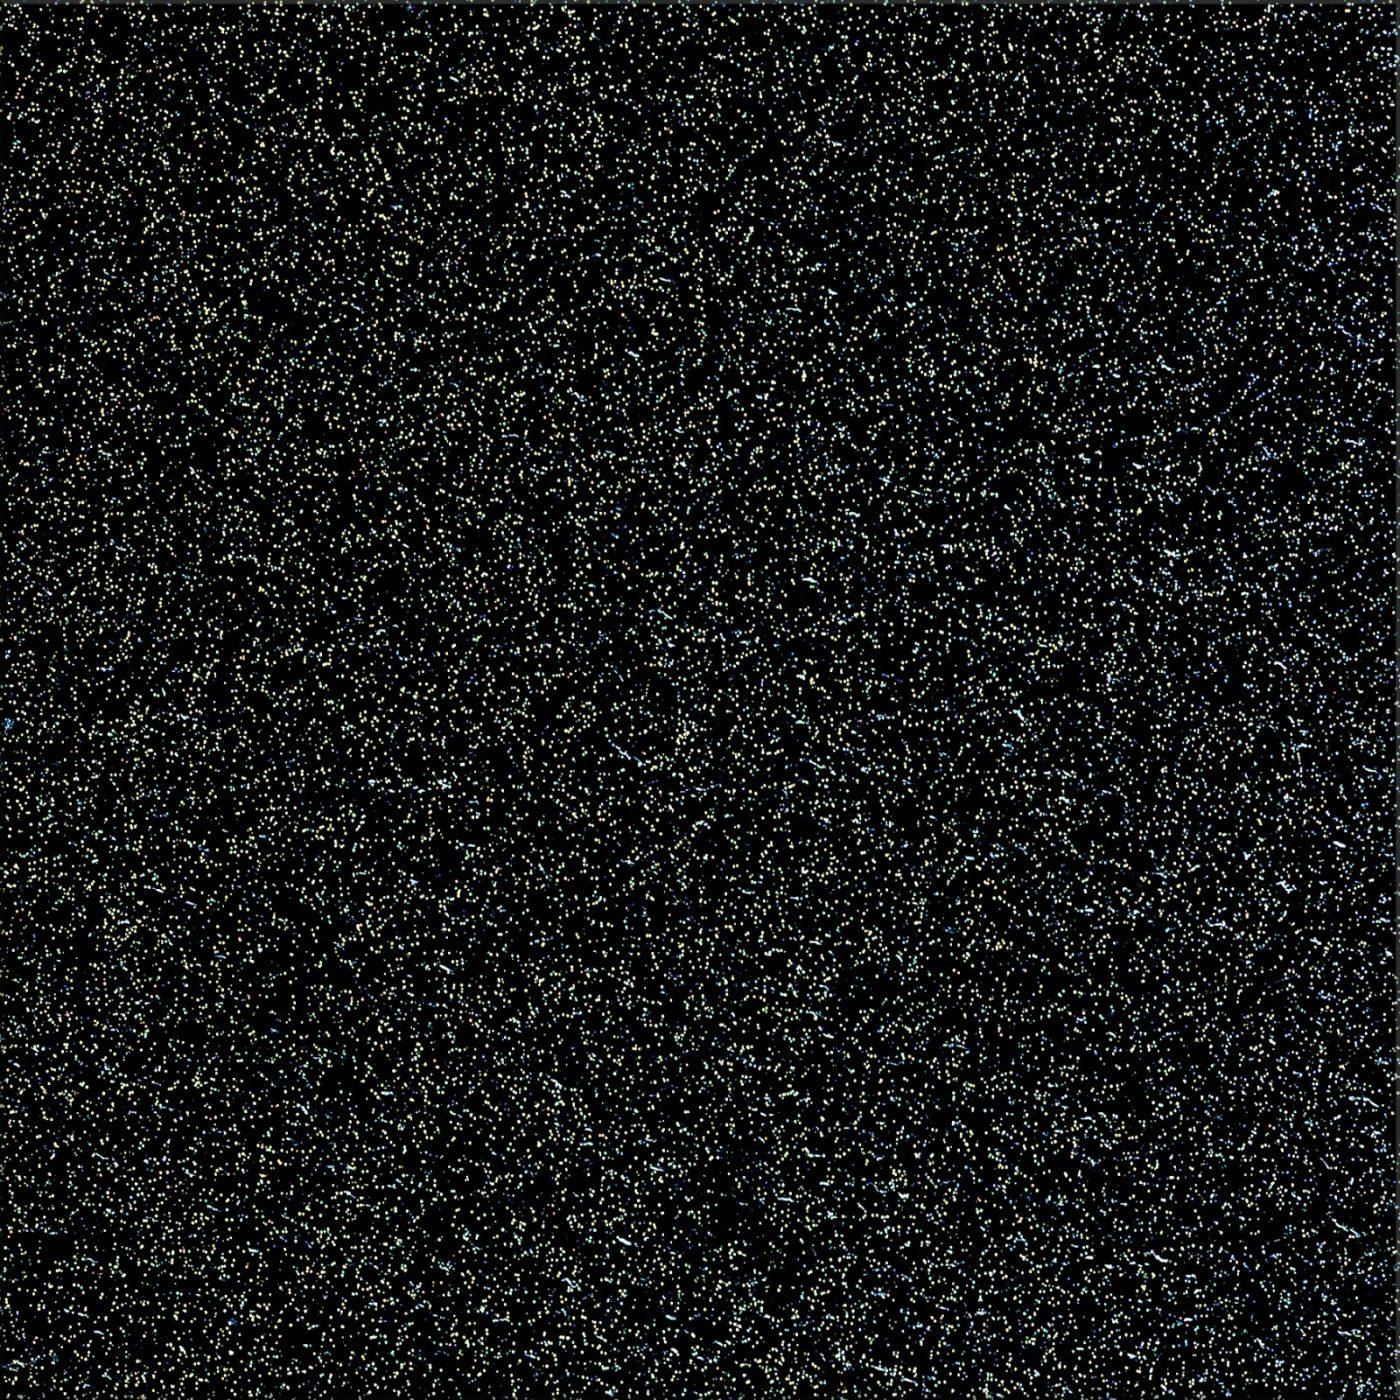 Sparkle Black swatch